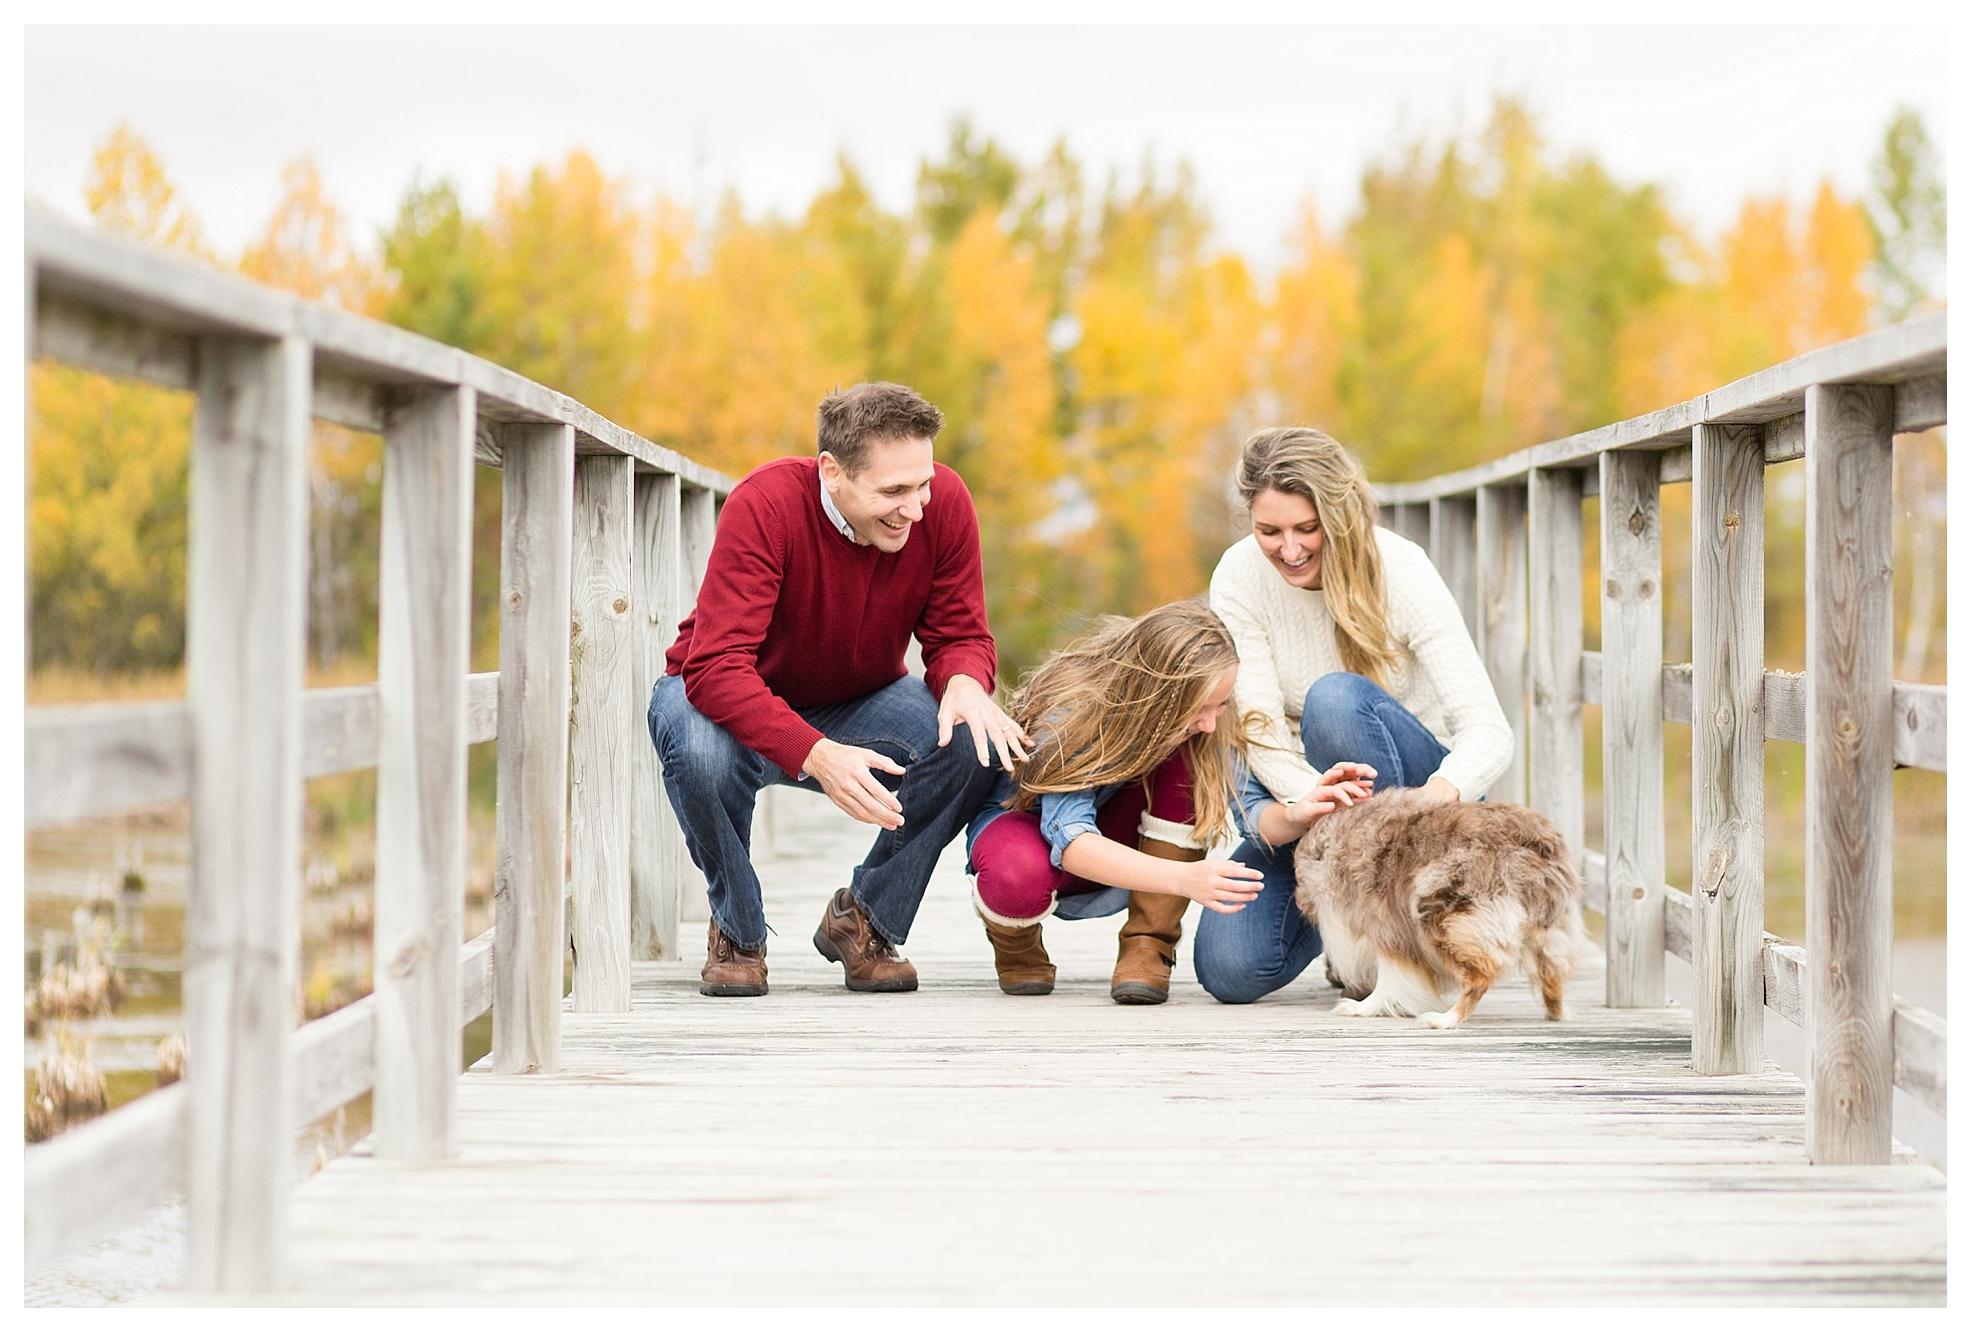 Houghton County Family Photographer_0170.jpg